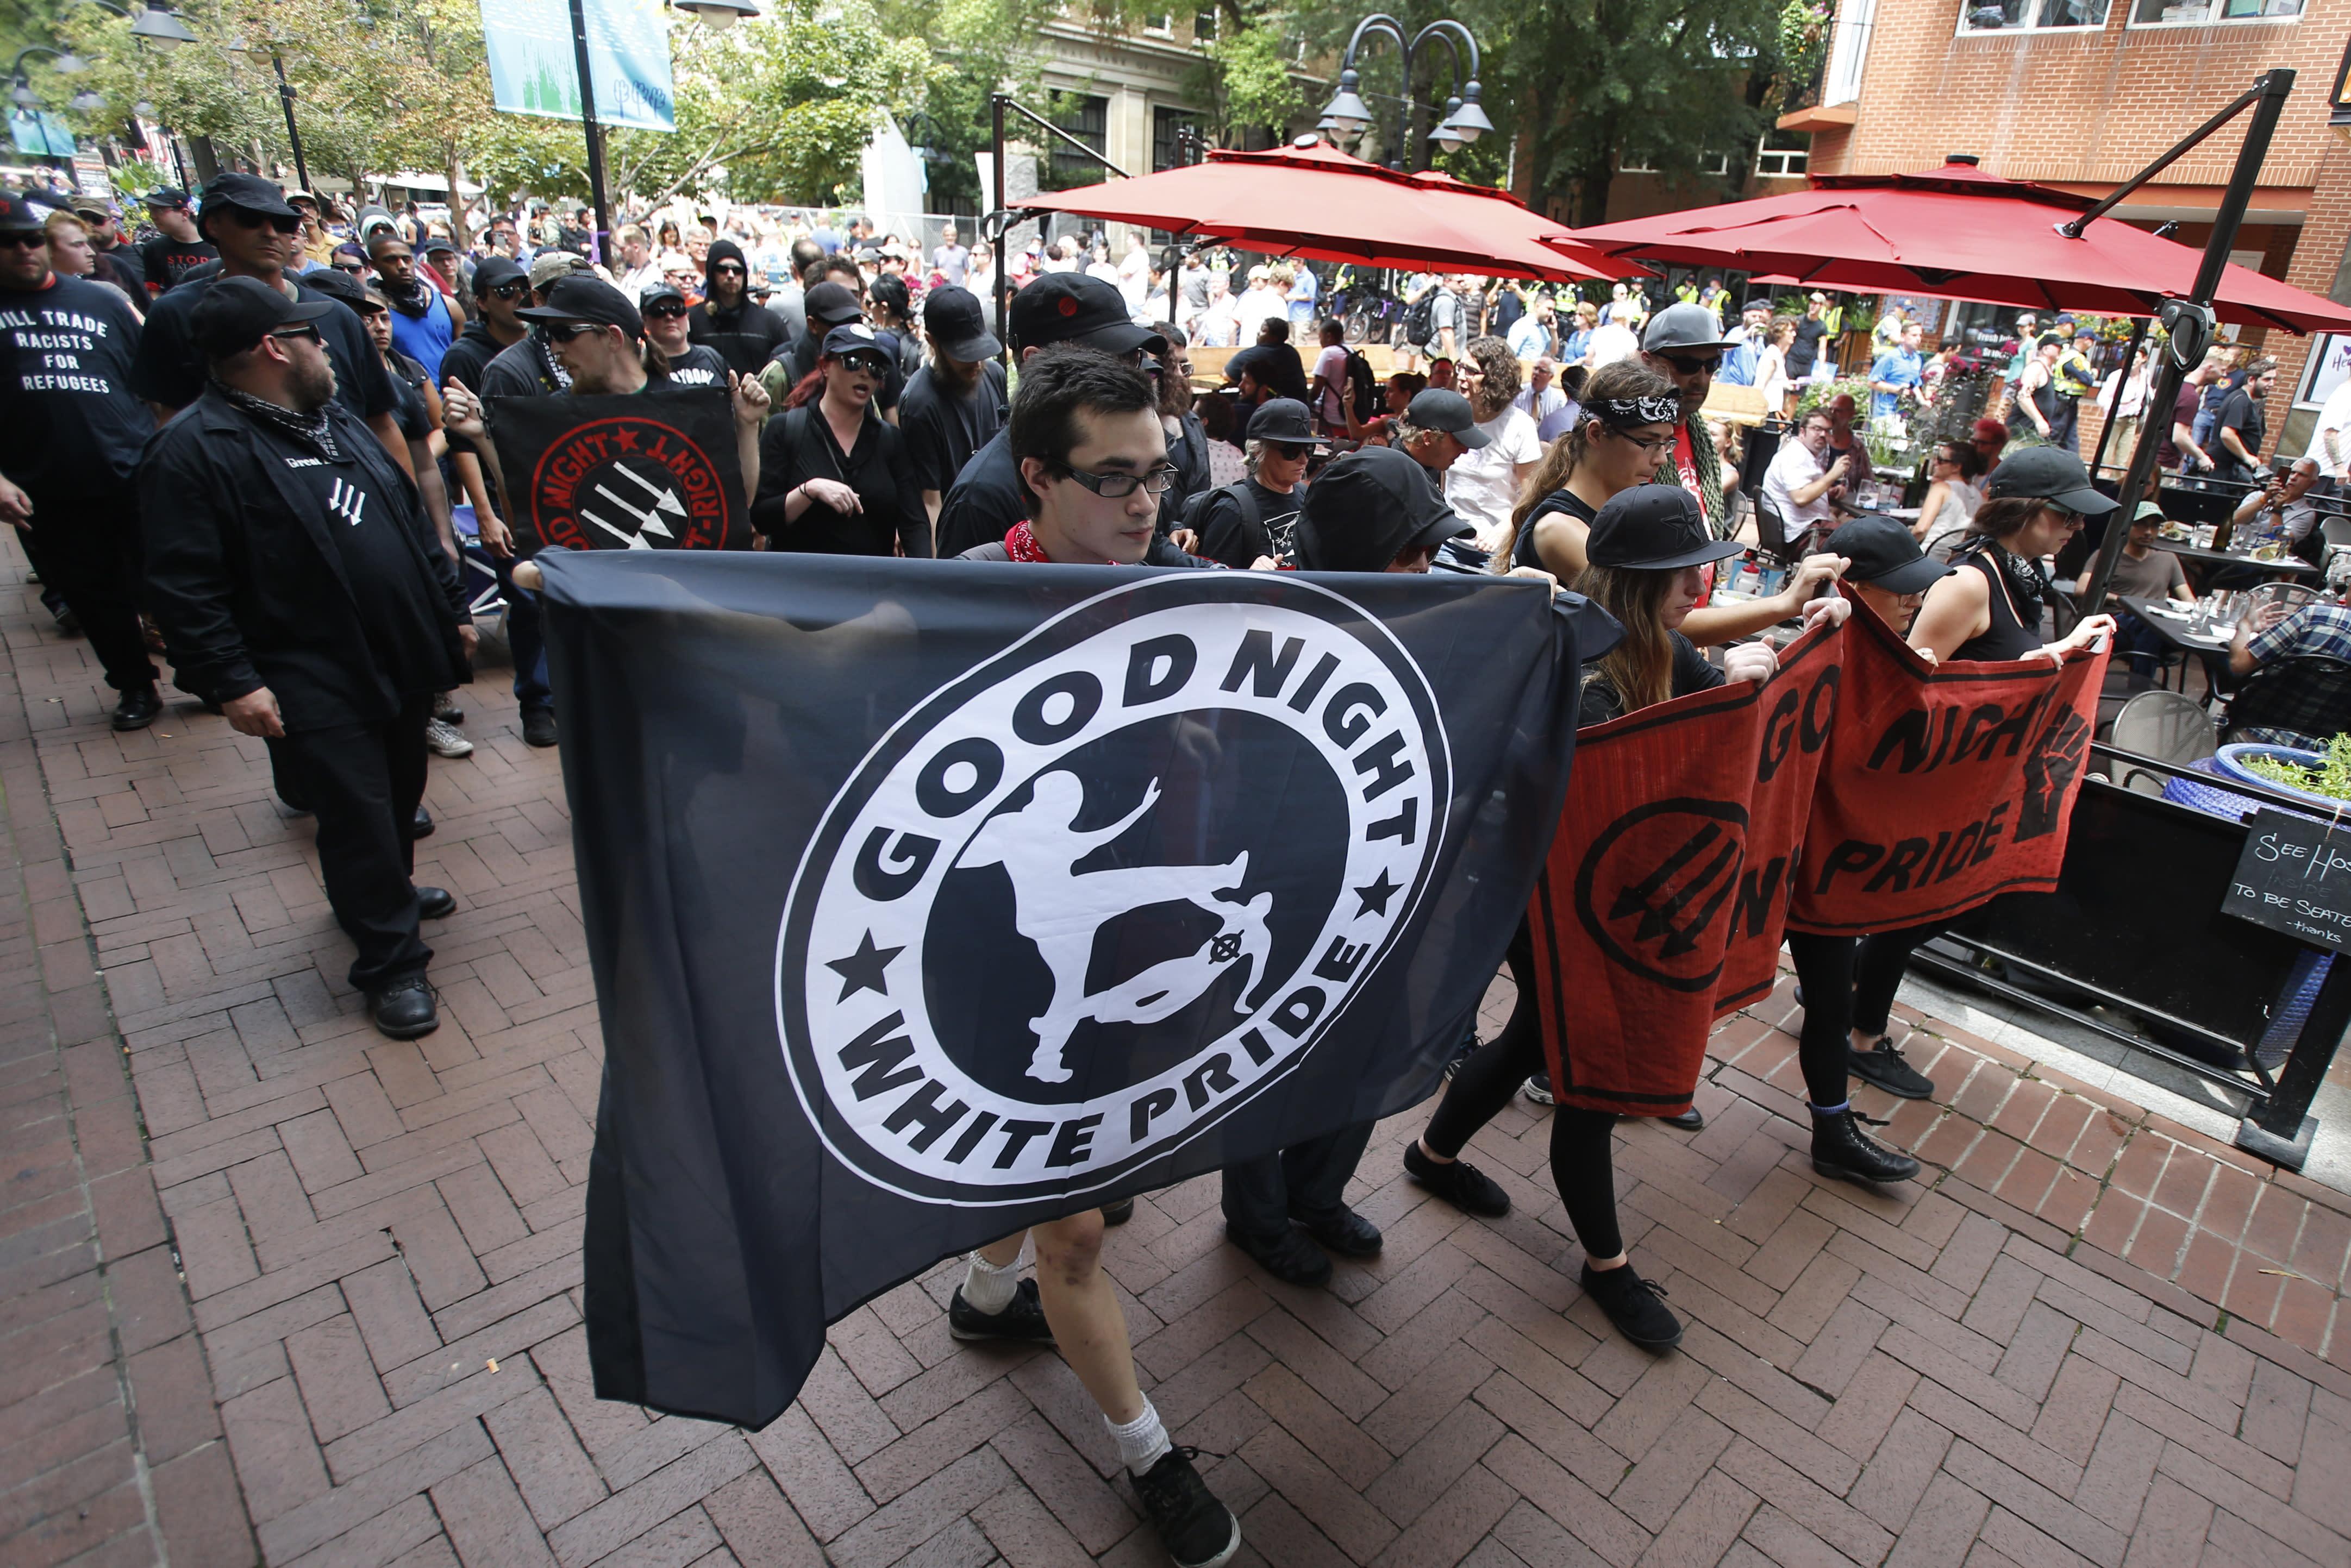 Latest: Anti-fascist demonstrators march in Charlottesville